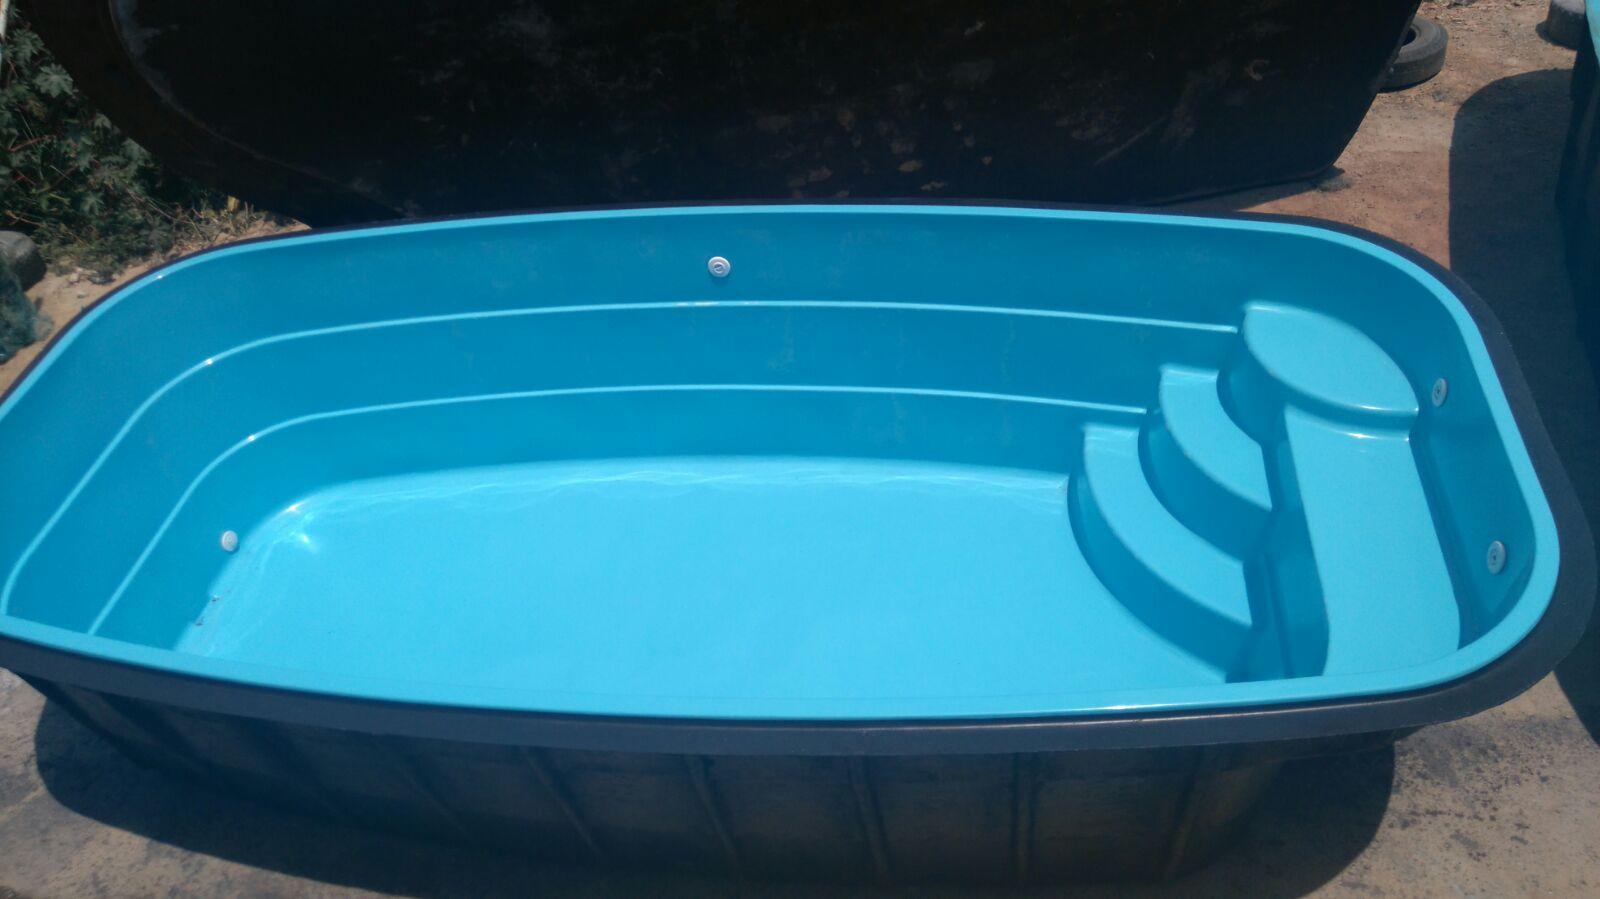 Piscina de fibra usada capa de segurana piscina fibra for Piscinas de fibra usadas